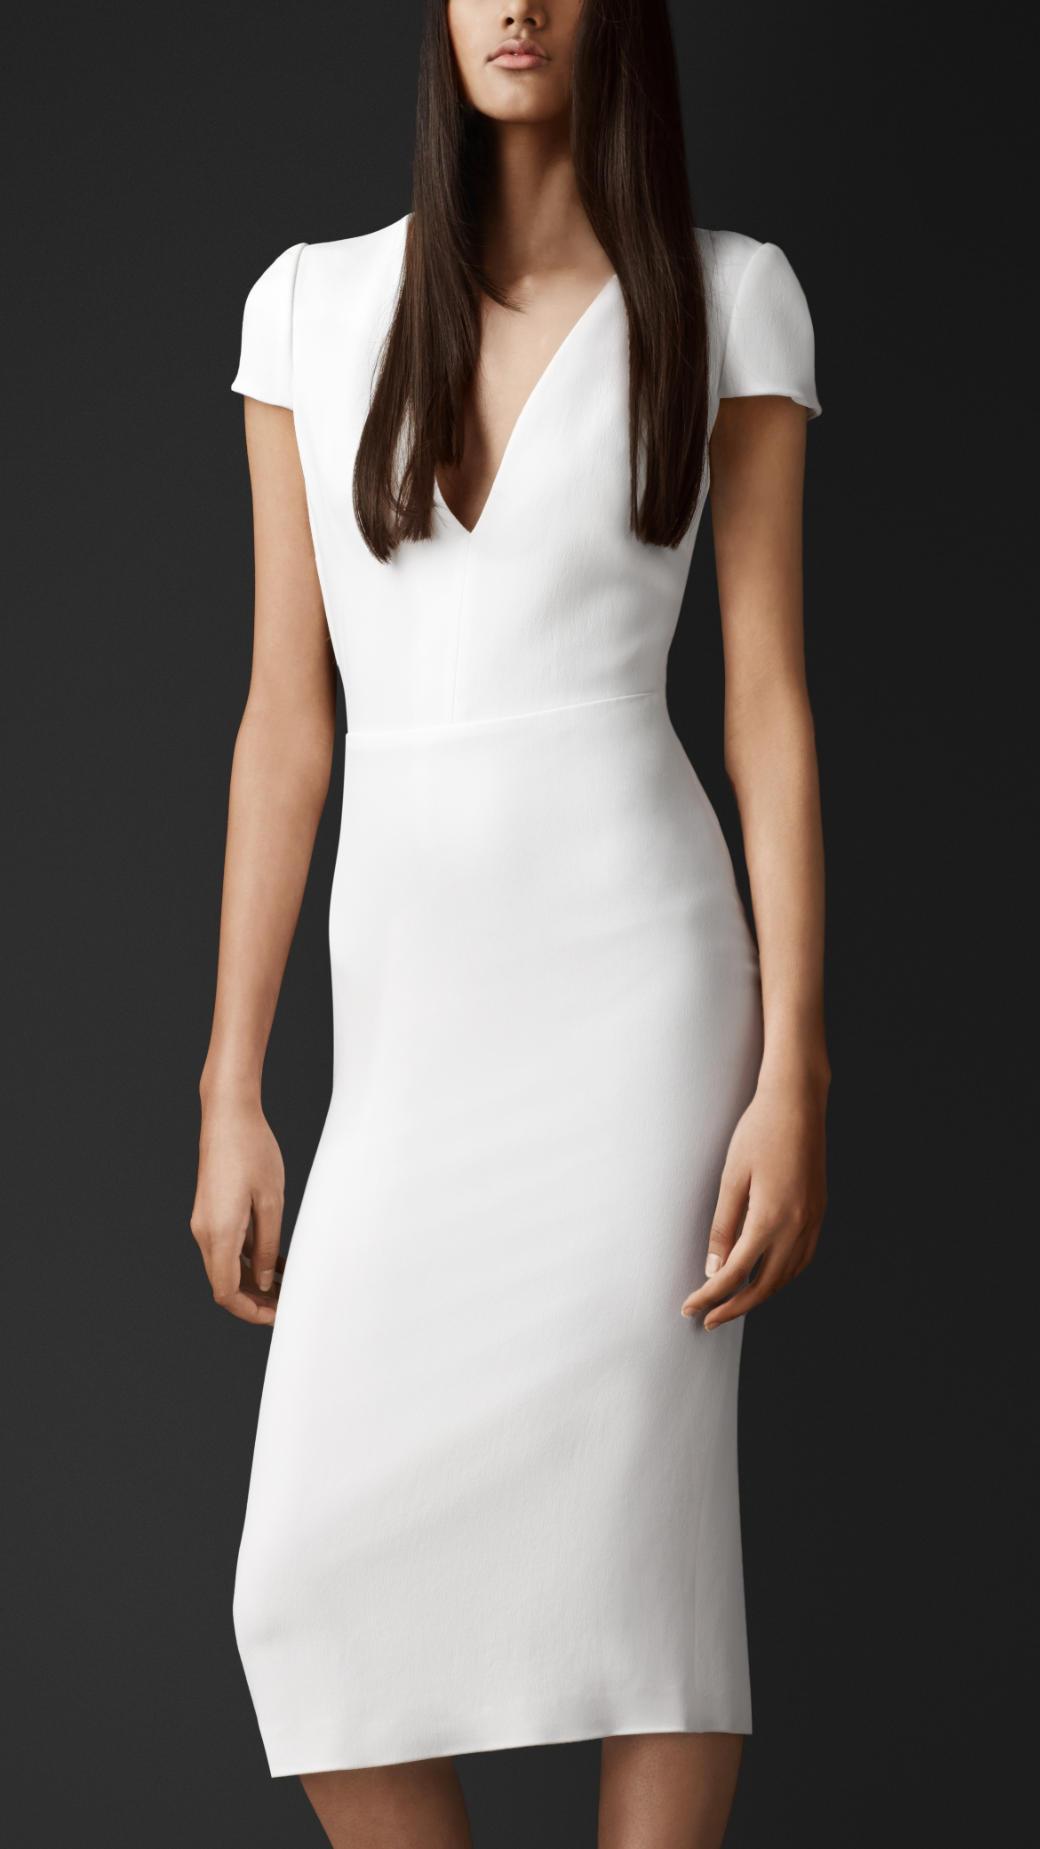 Burberry Geometric Cutout Crêpe Dress in White - Lyst